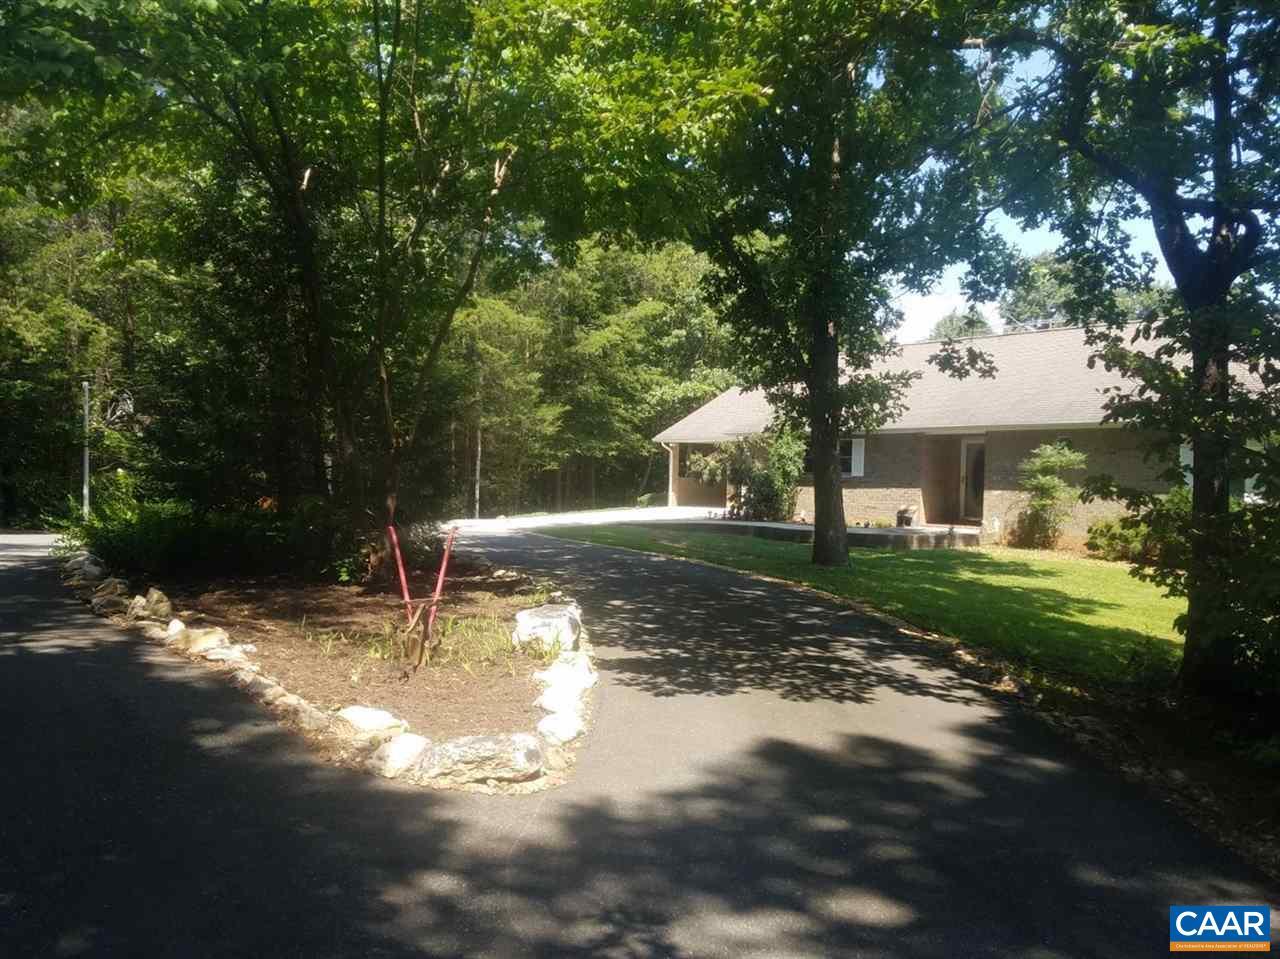 705 BOXWOOD FARM RD, AMHERST, VA 24521